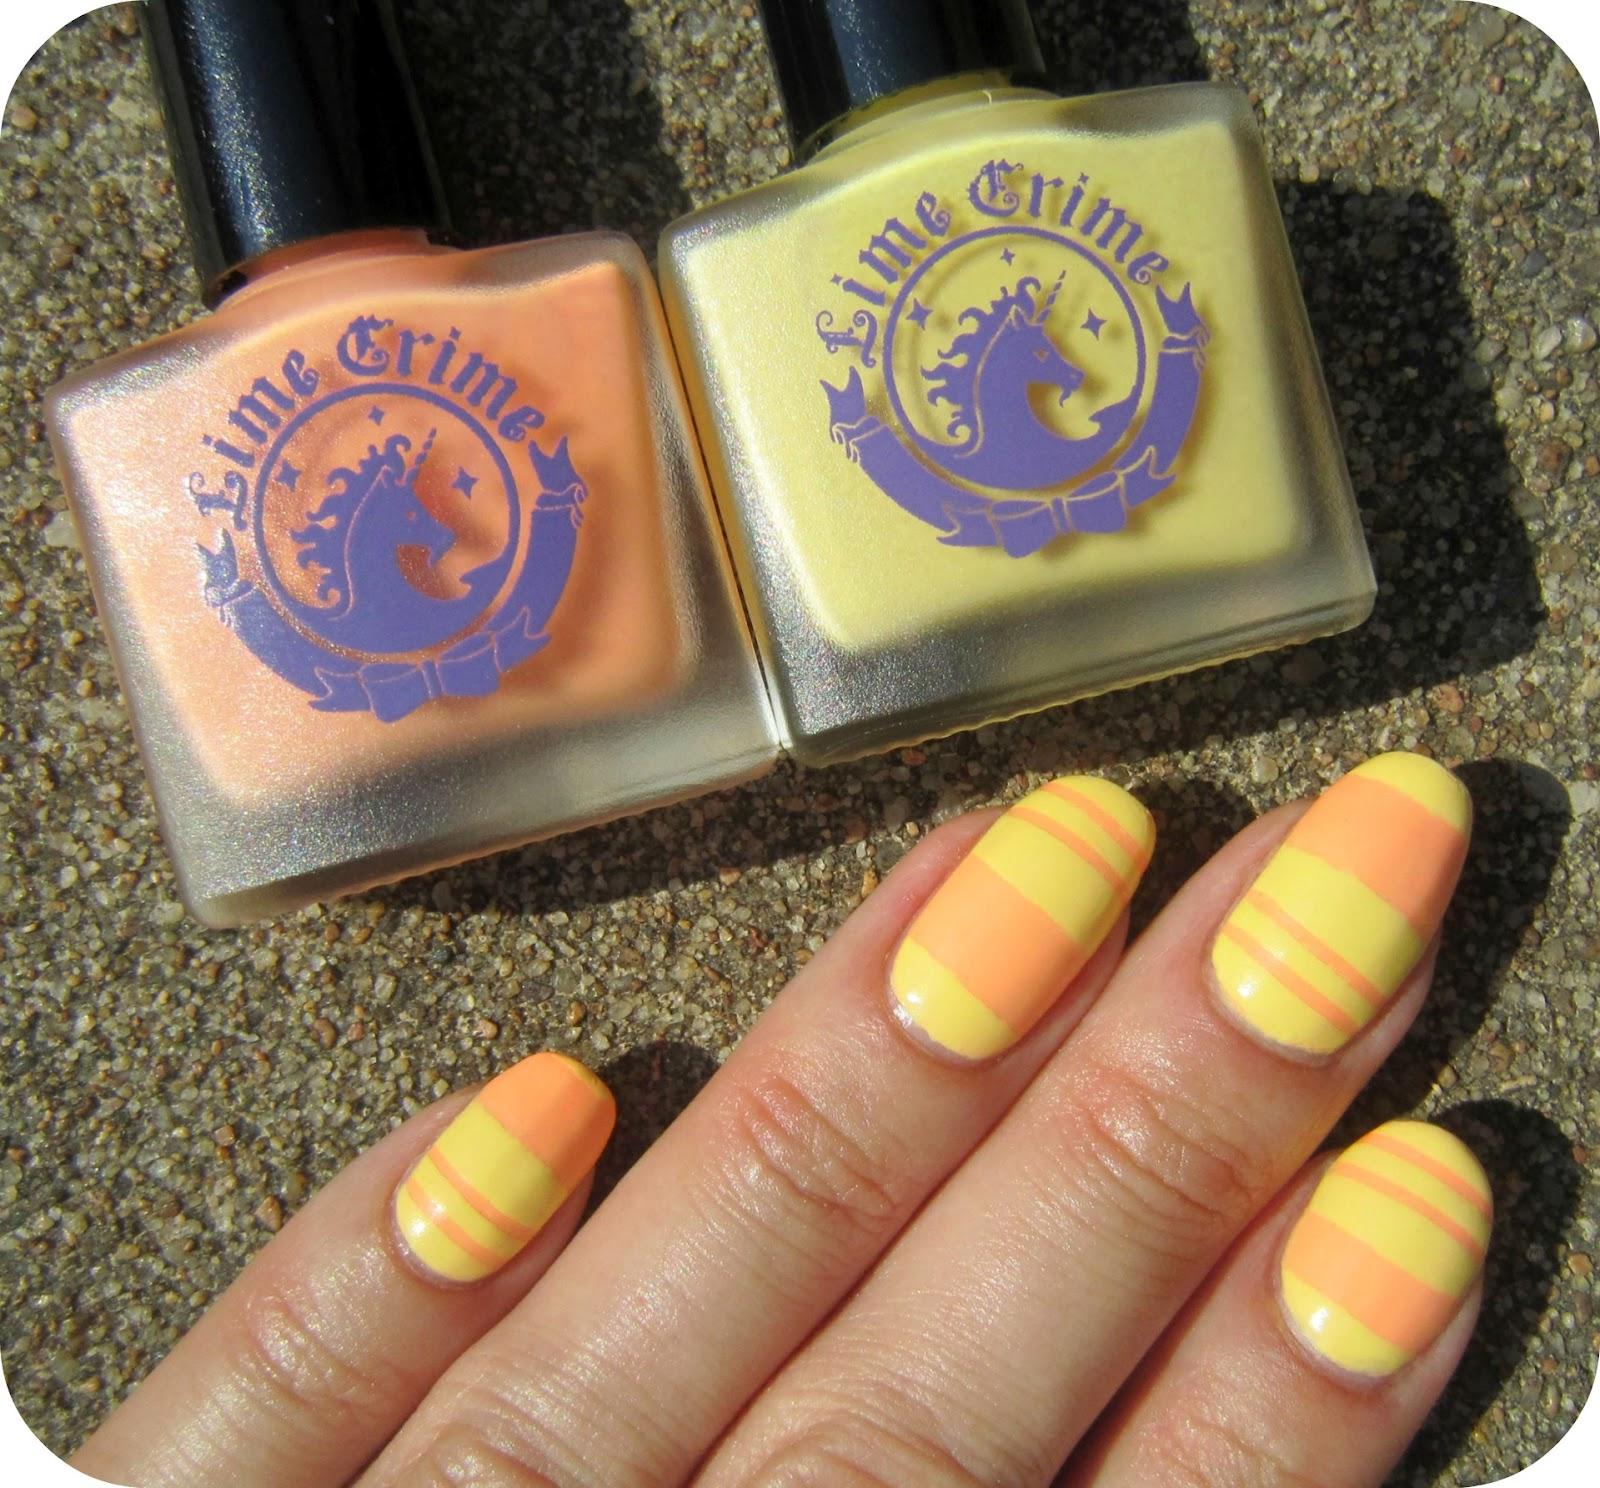 Concrete And Nail Polish Striped Nail Art: Concrete And Nail Polish: Lime Crime Peaches Cream